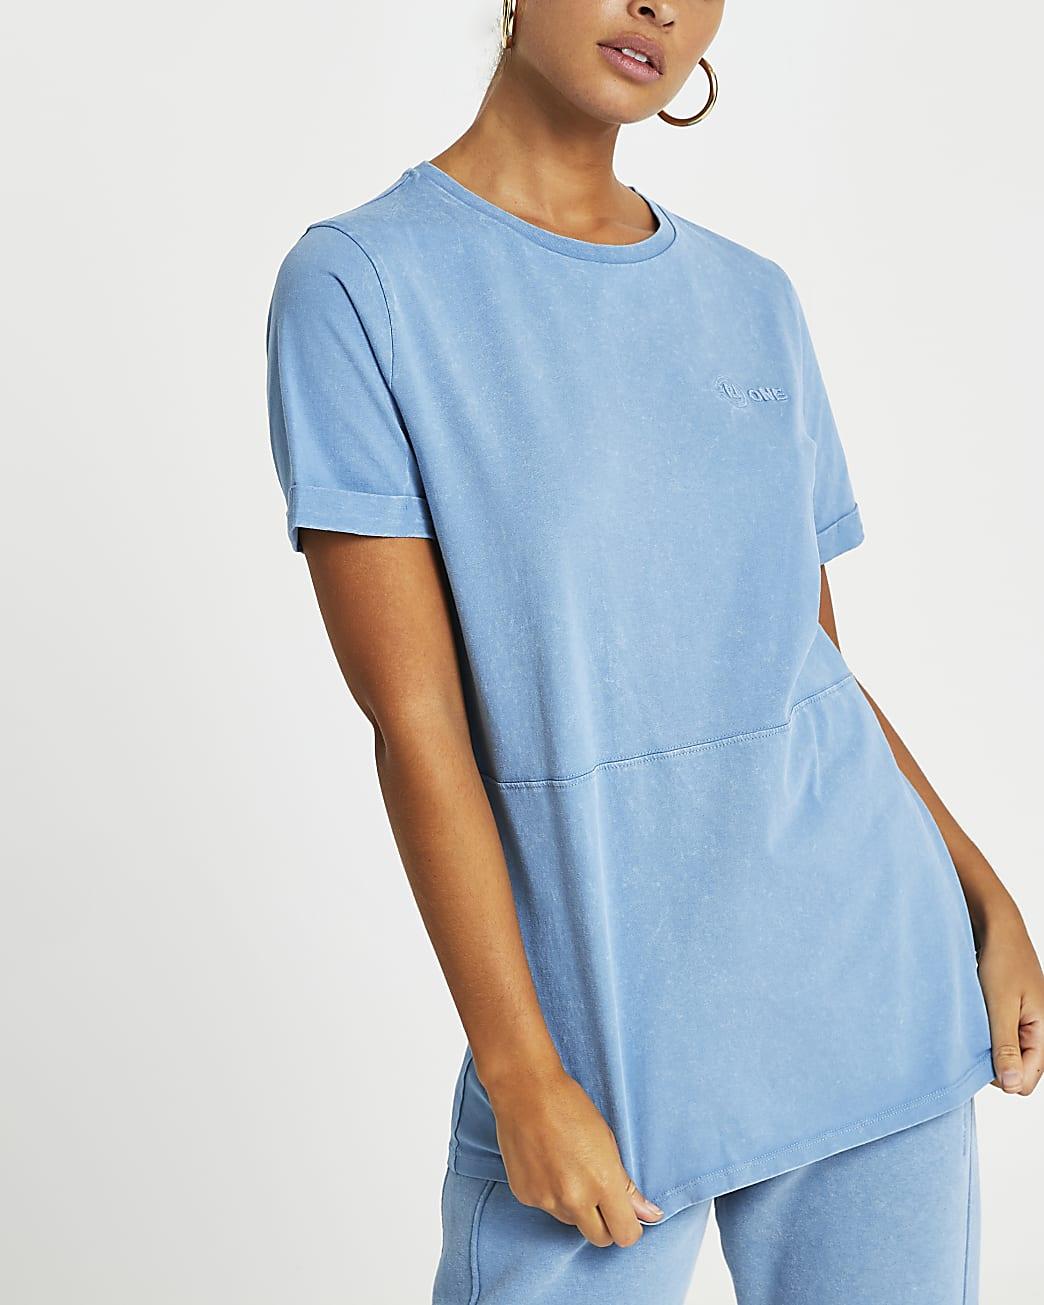 Blue RI ONE washed t-shirt